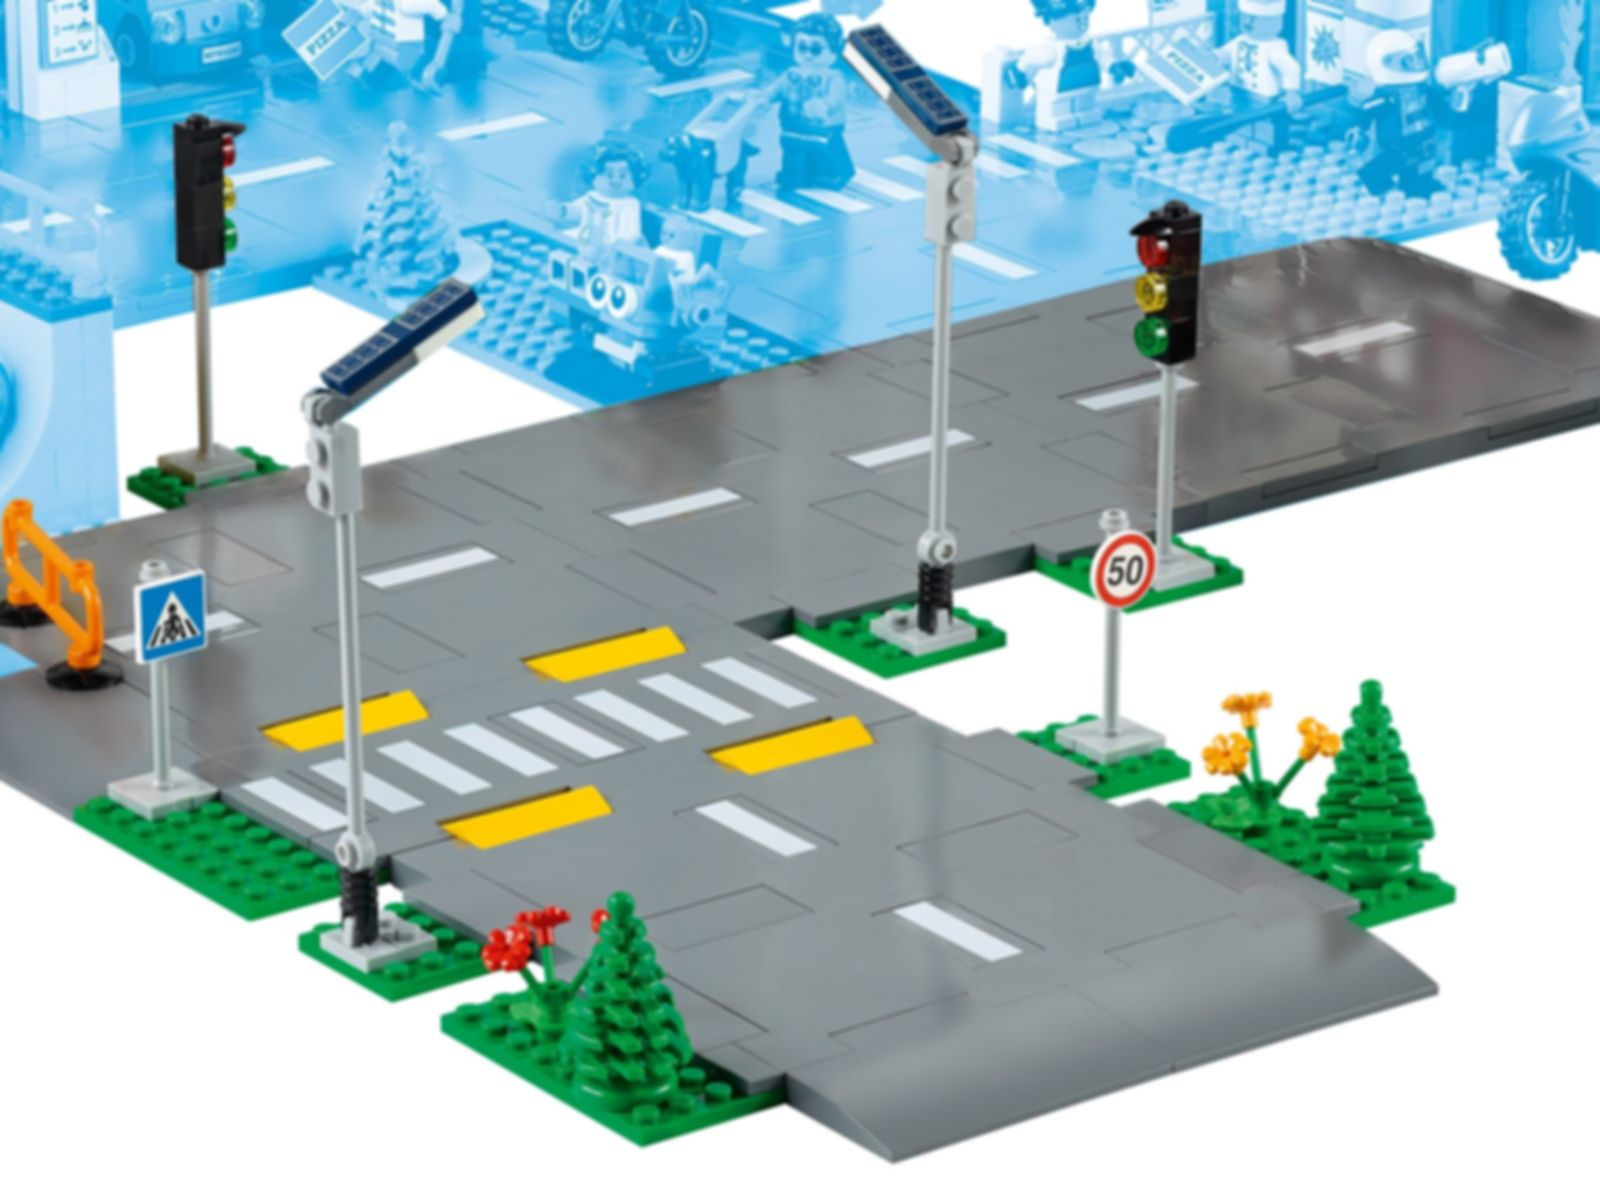 Road Plates components